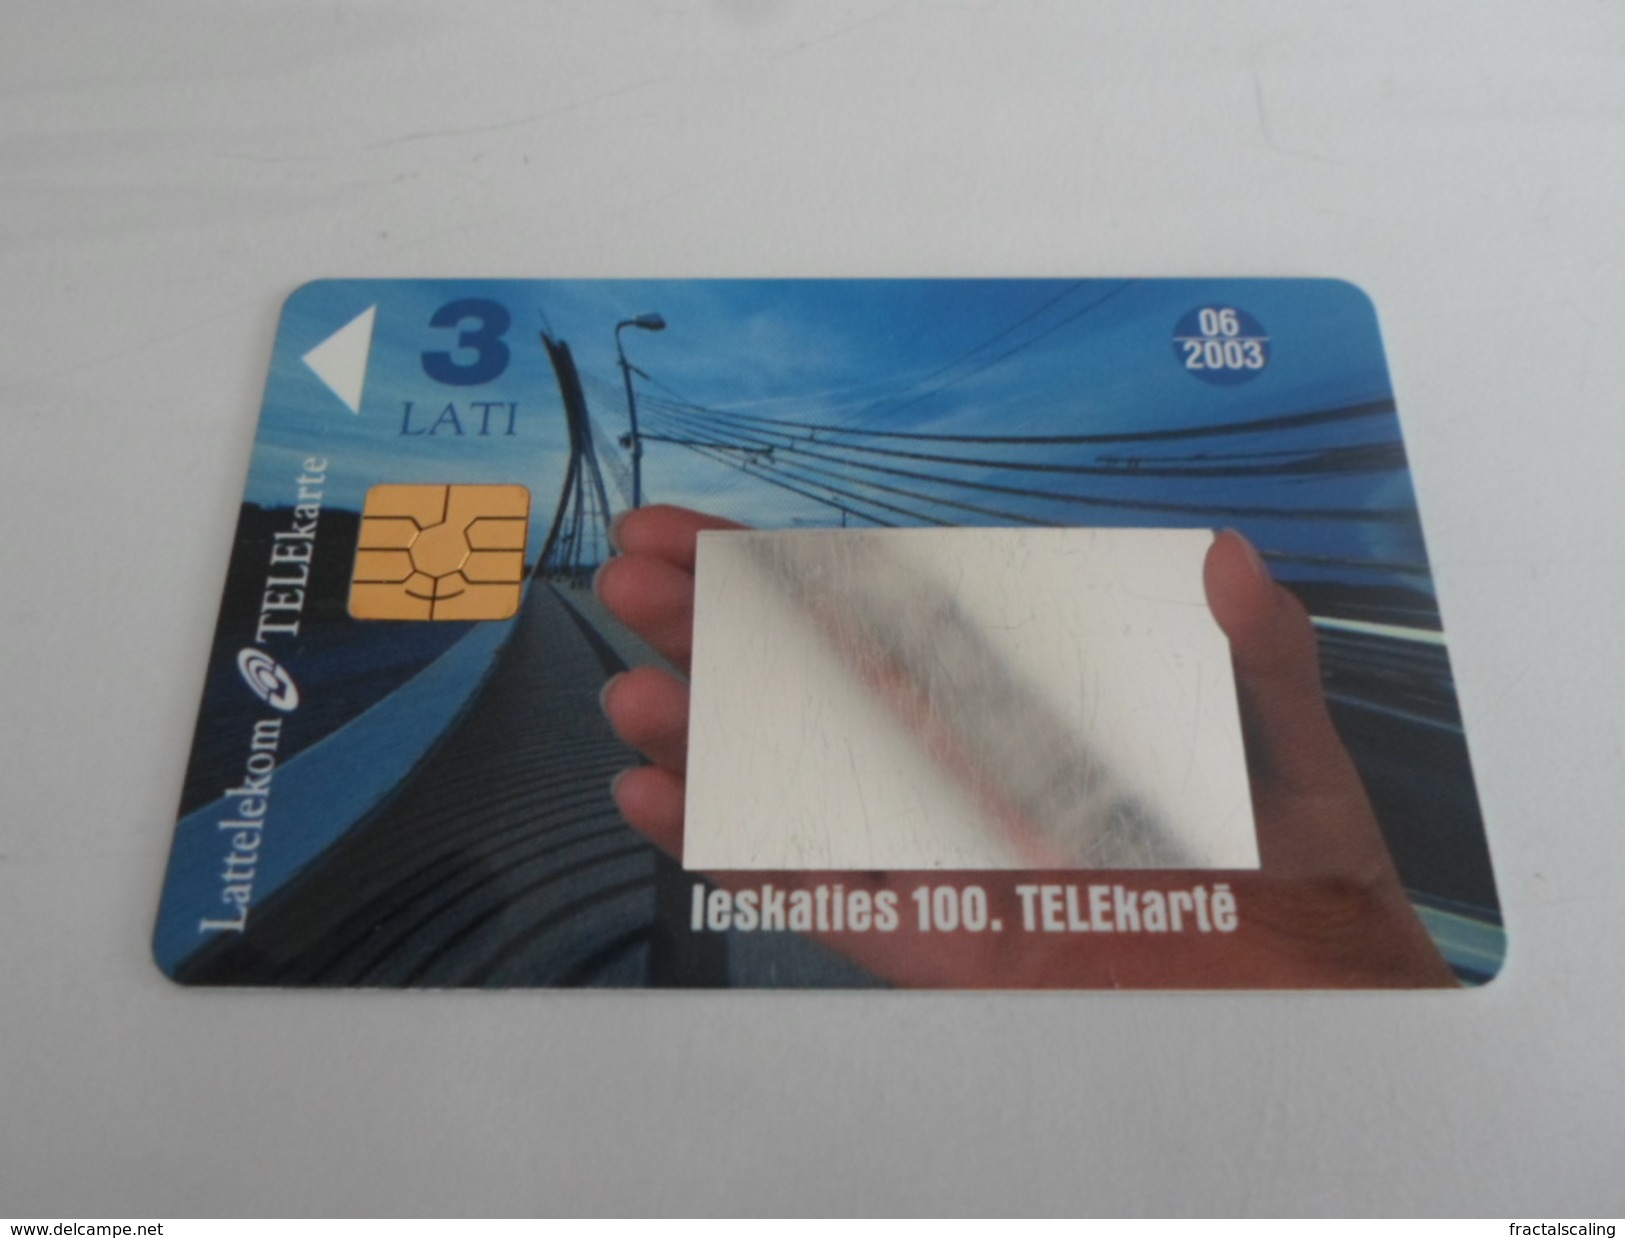 LATVIA - Nice Chipphonecard As On Photo - Latvia